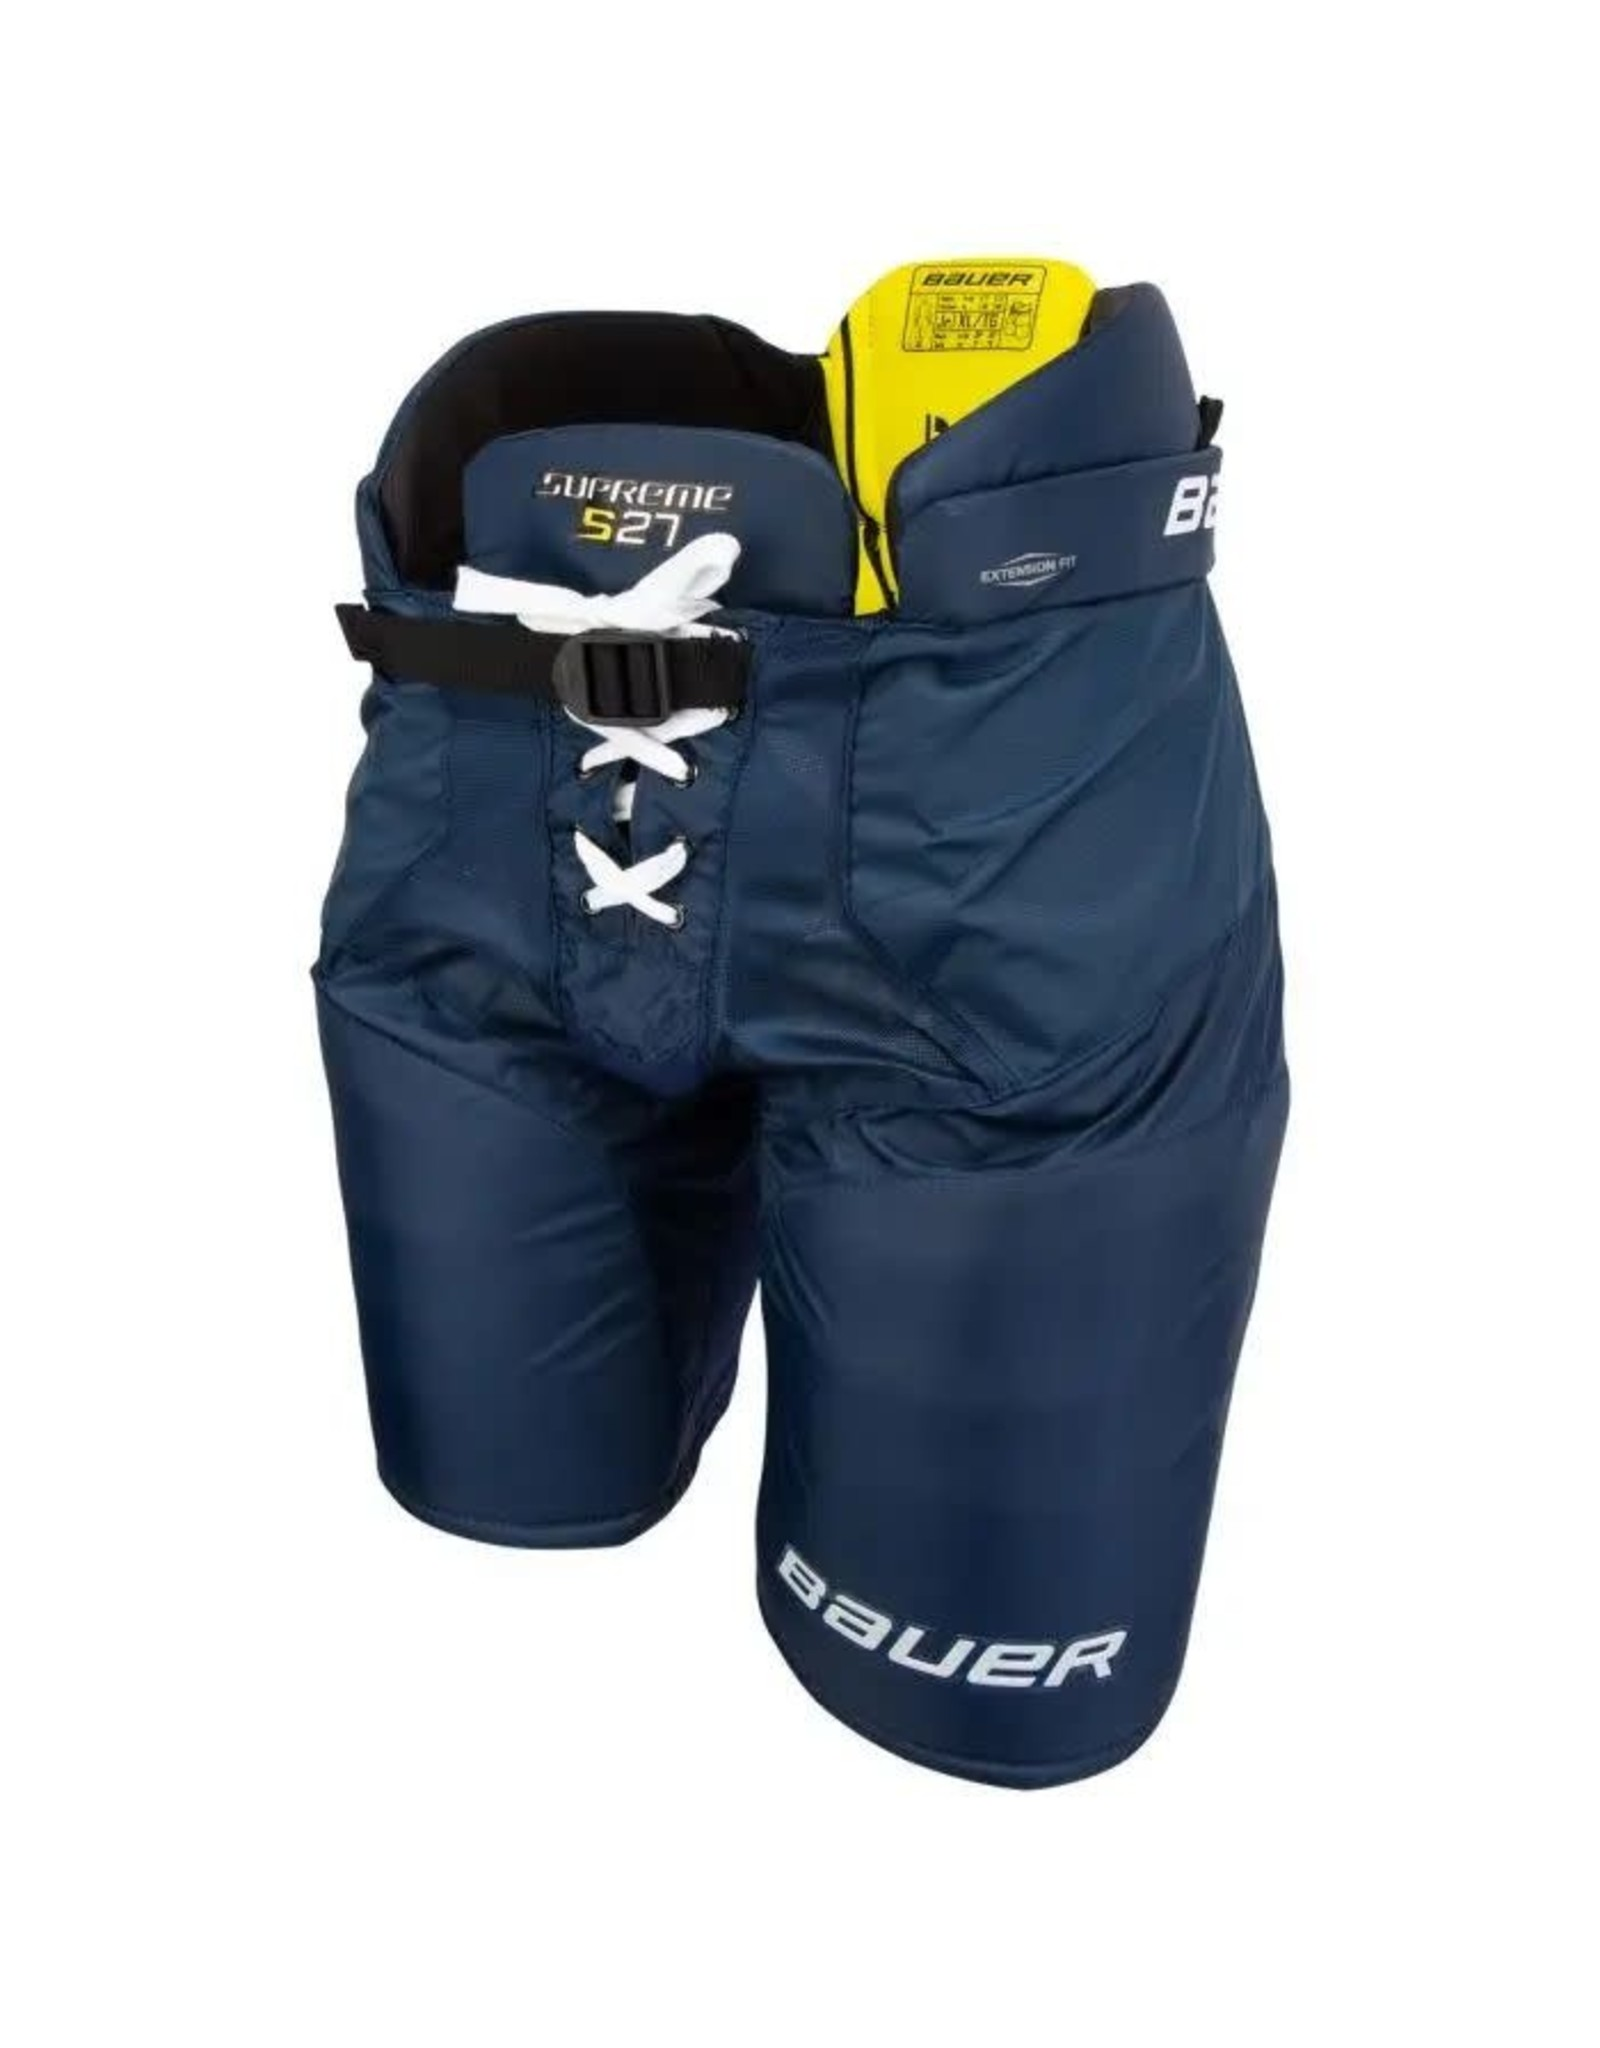 BAUER Pants, Junior, Supreme S27